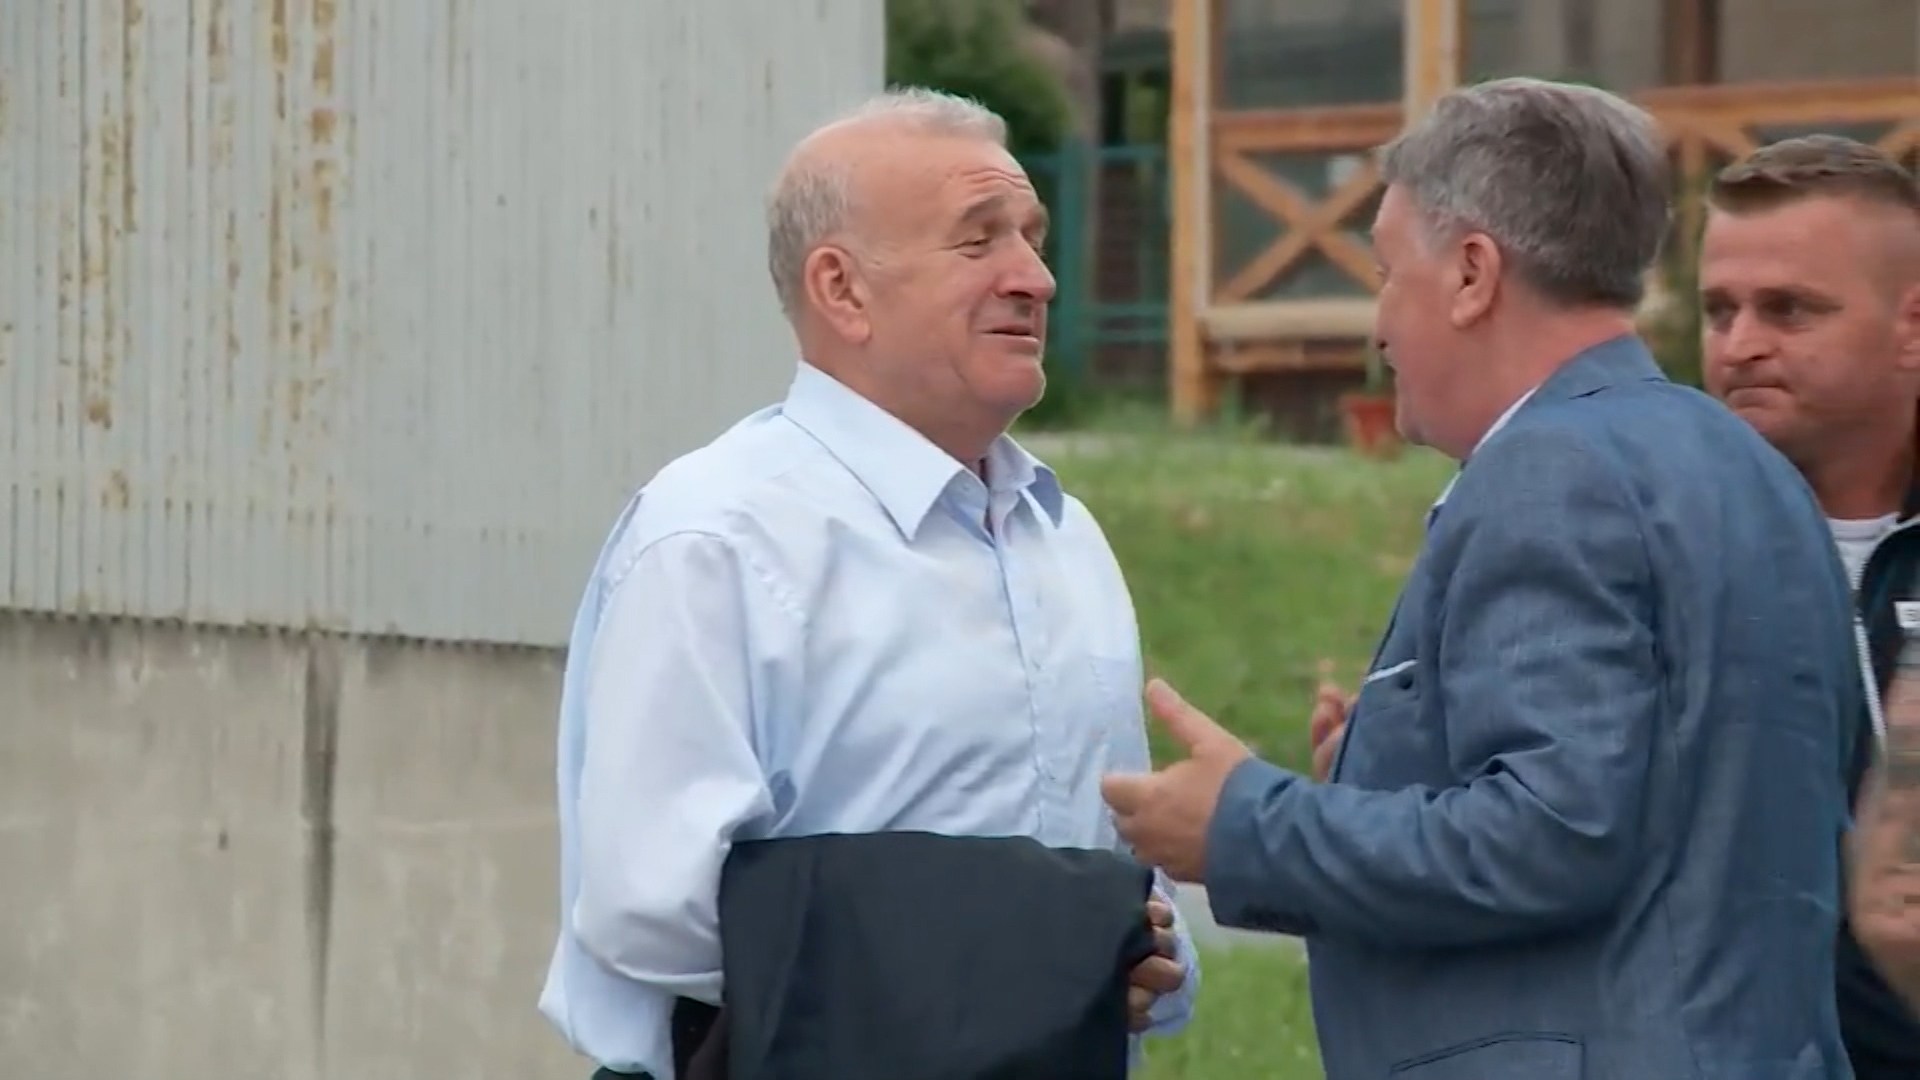 Indictment against general Atif Dudaković confirmed